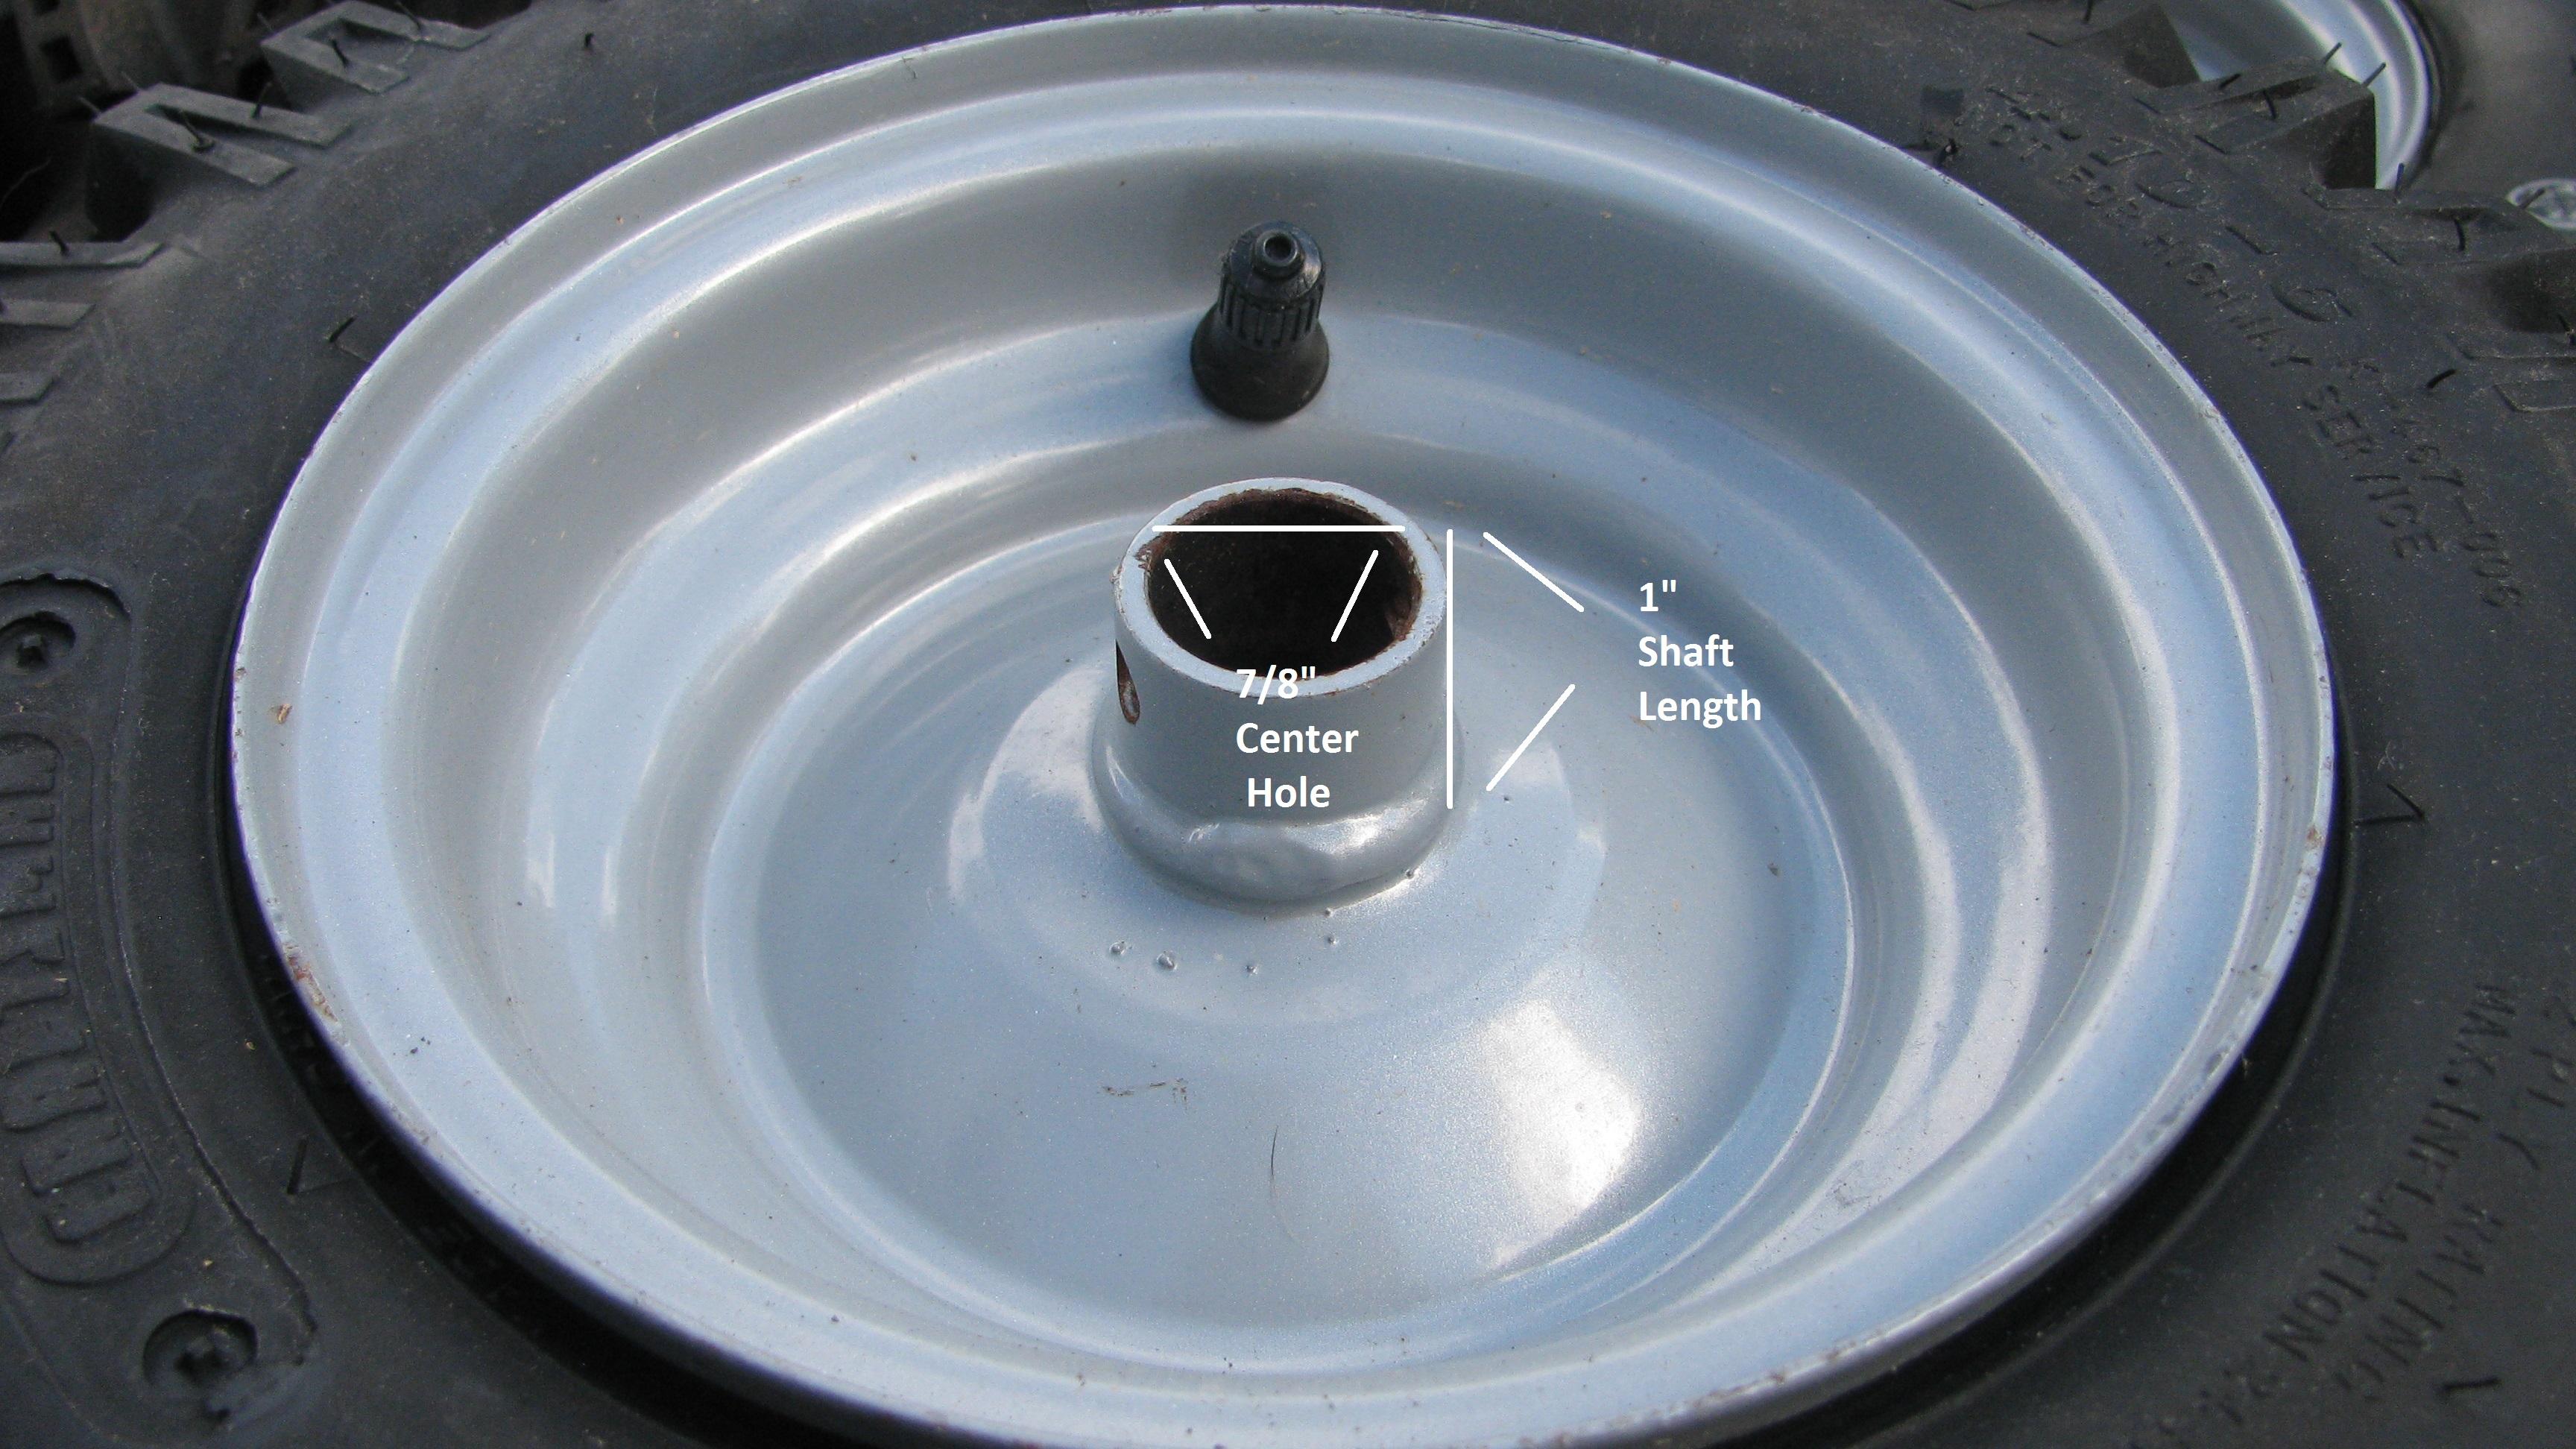 1 4 10 6 4 10x6 Snow Blower Thrower Tiller Tire Rim Wheel Assembly Left